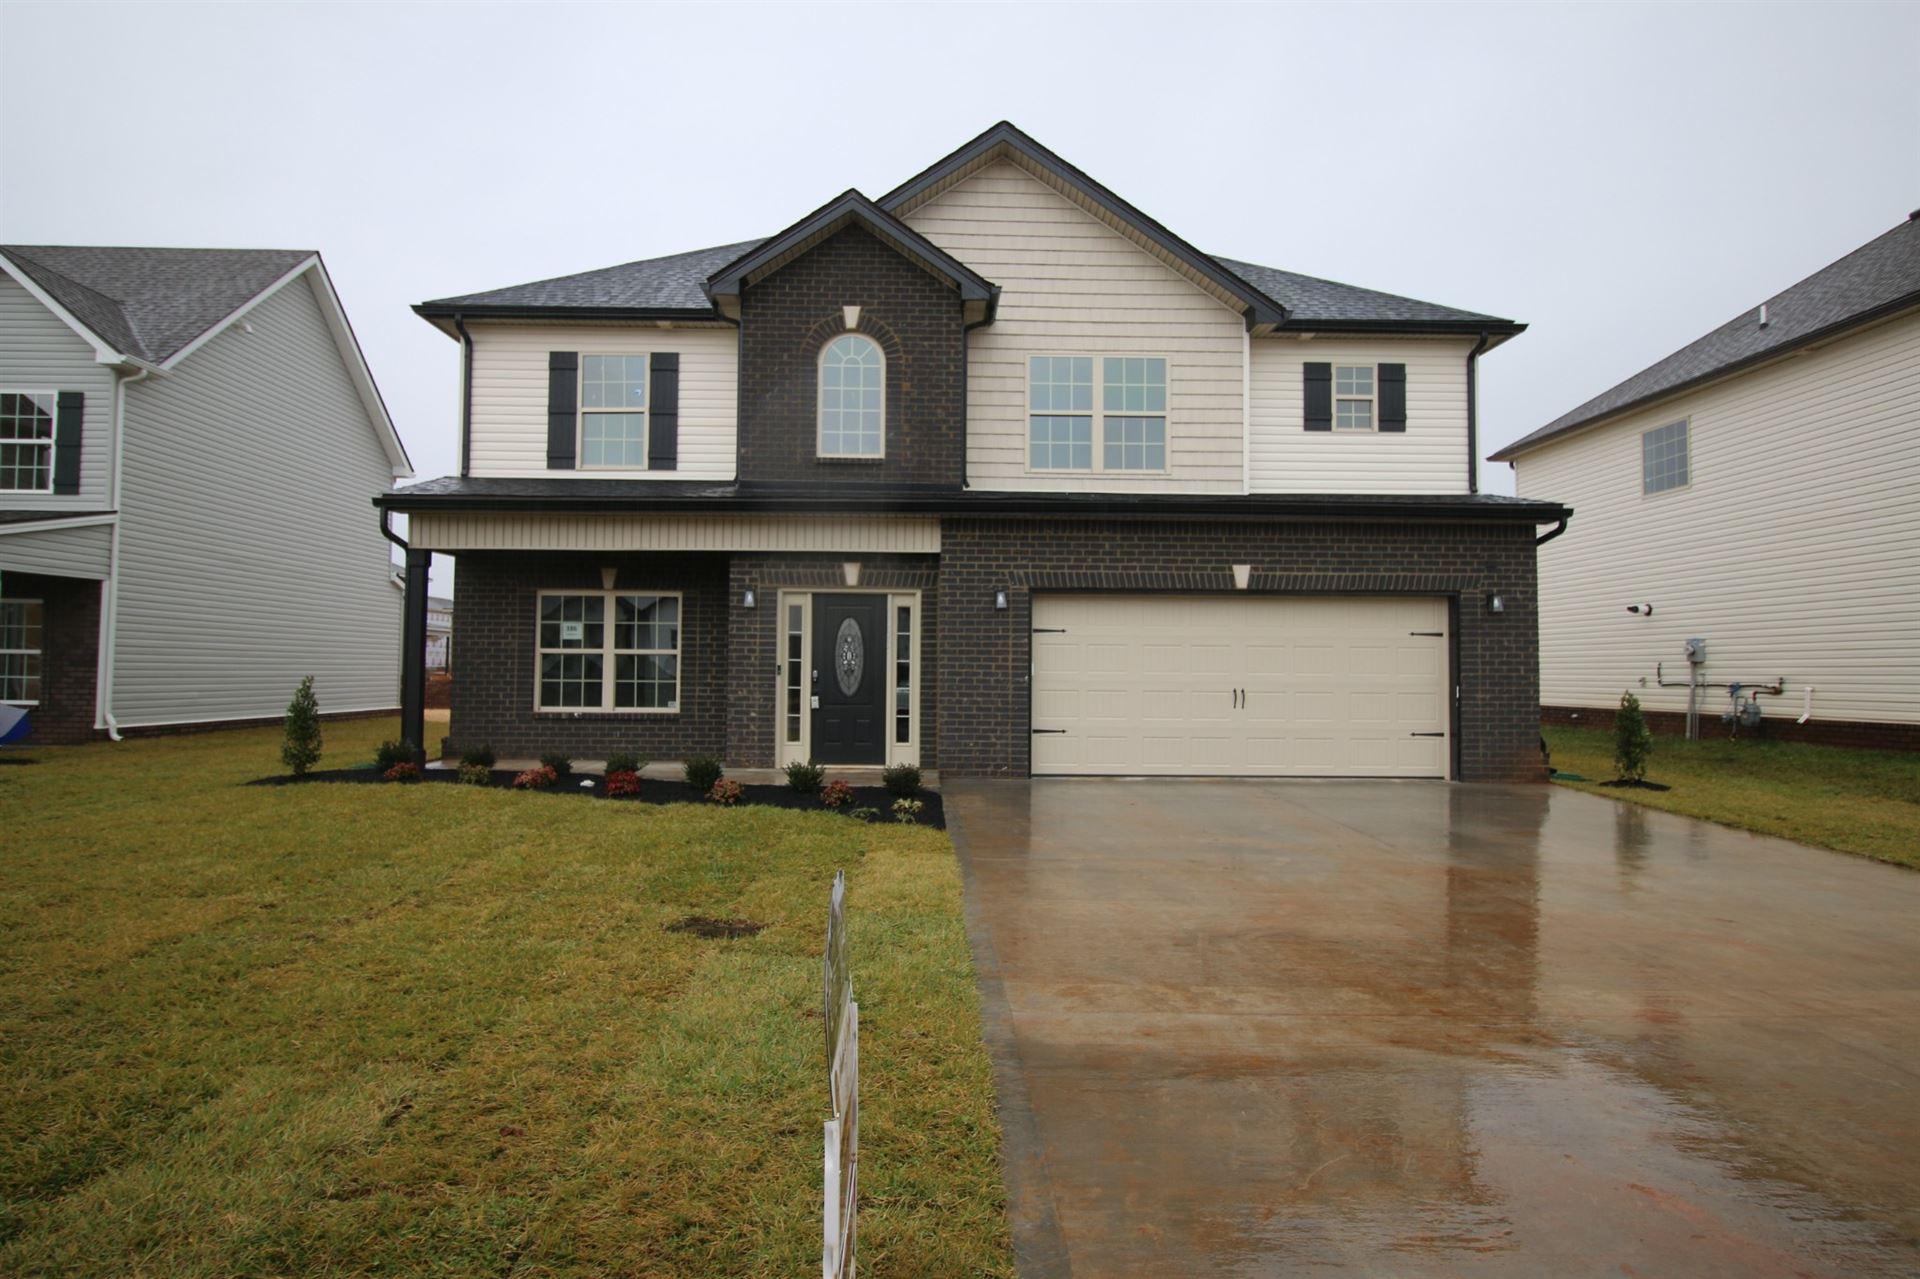 386 Summerfield, Clarksville, TN 37040 - MLS#: 2292855